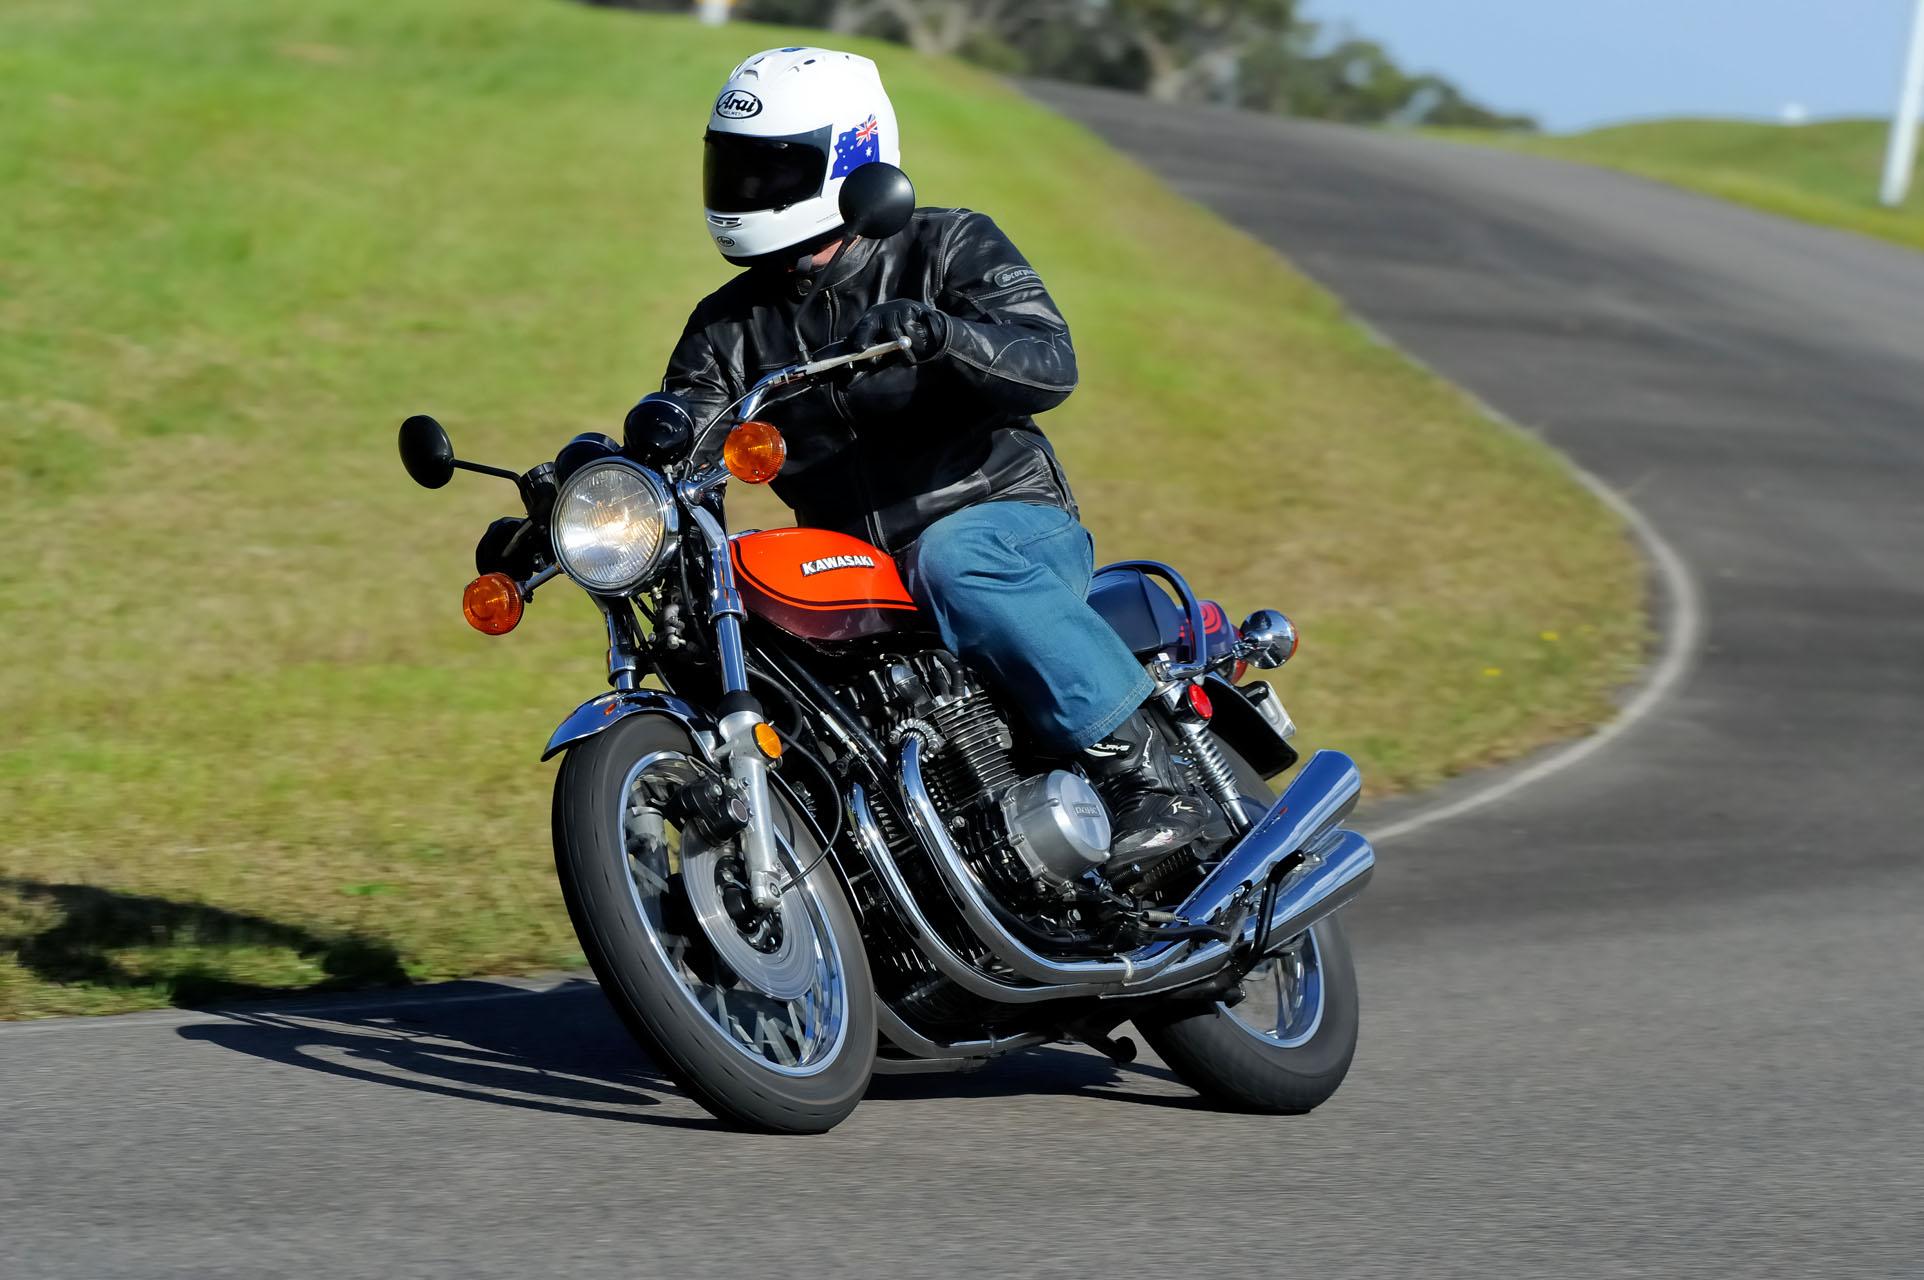 History Kawasaki Legend Z1 900 New York Steak Bike Review Z900 A4 Wiring Diagram Bikereview Z9 Jaffa 3